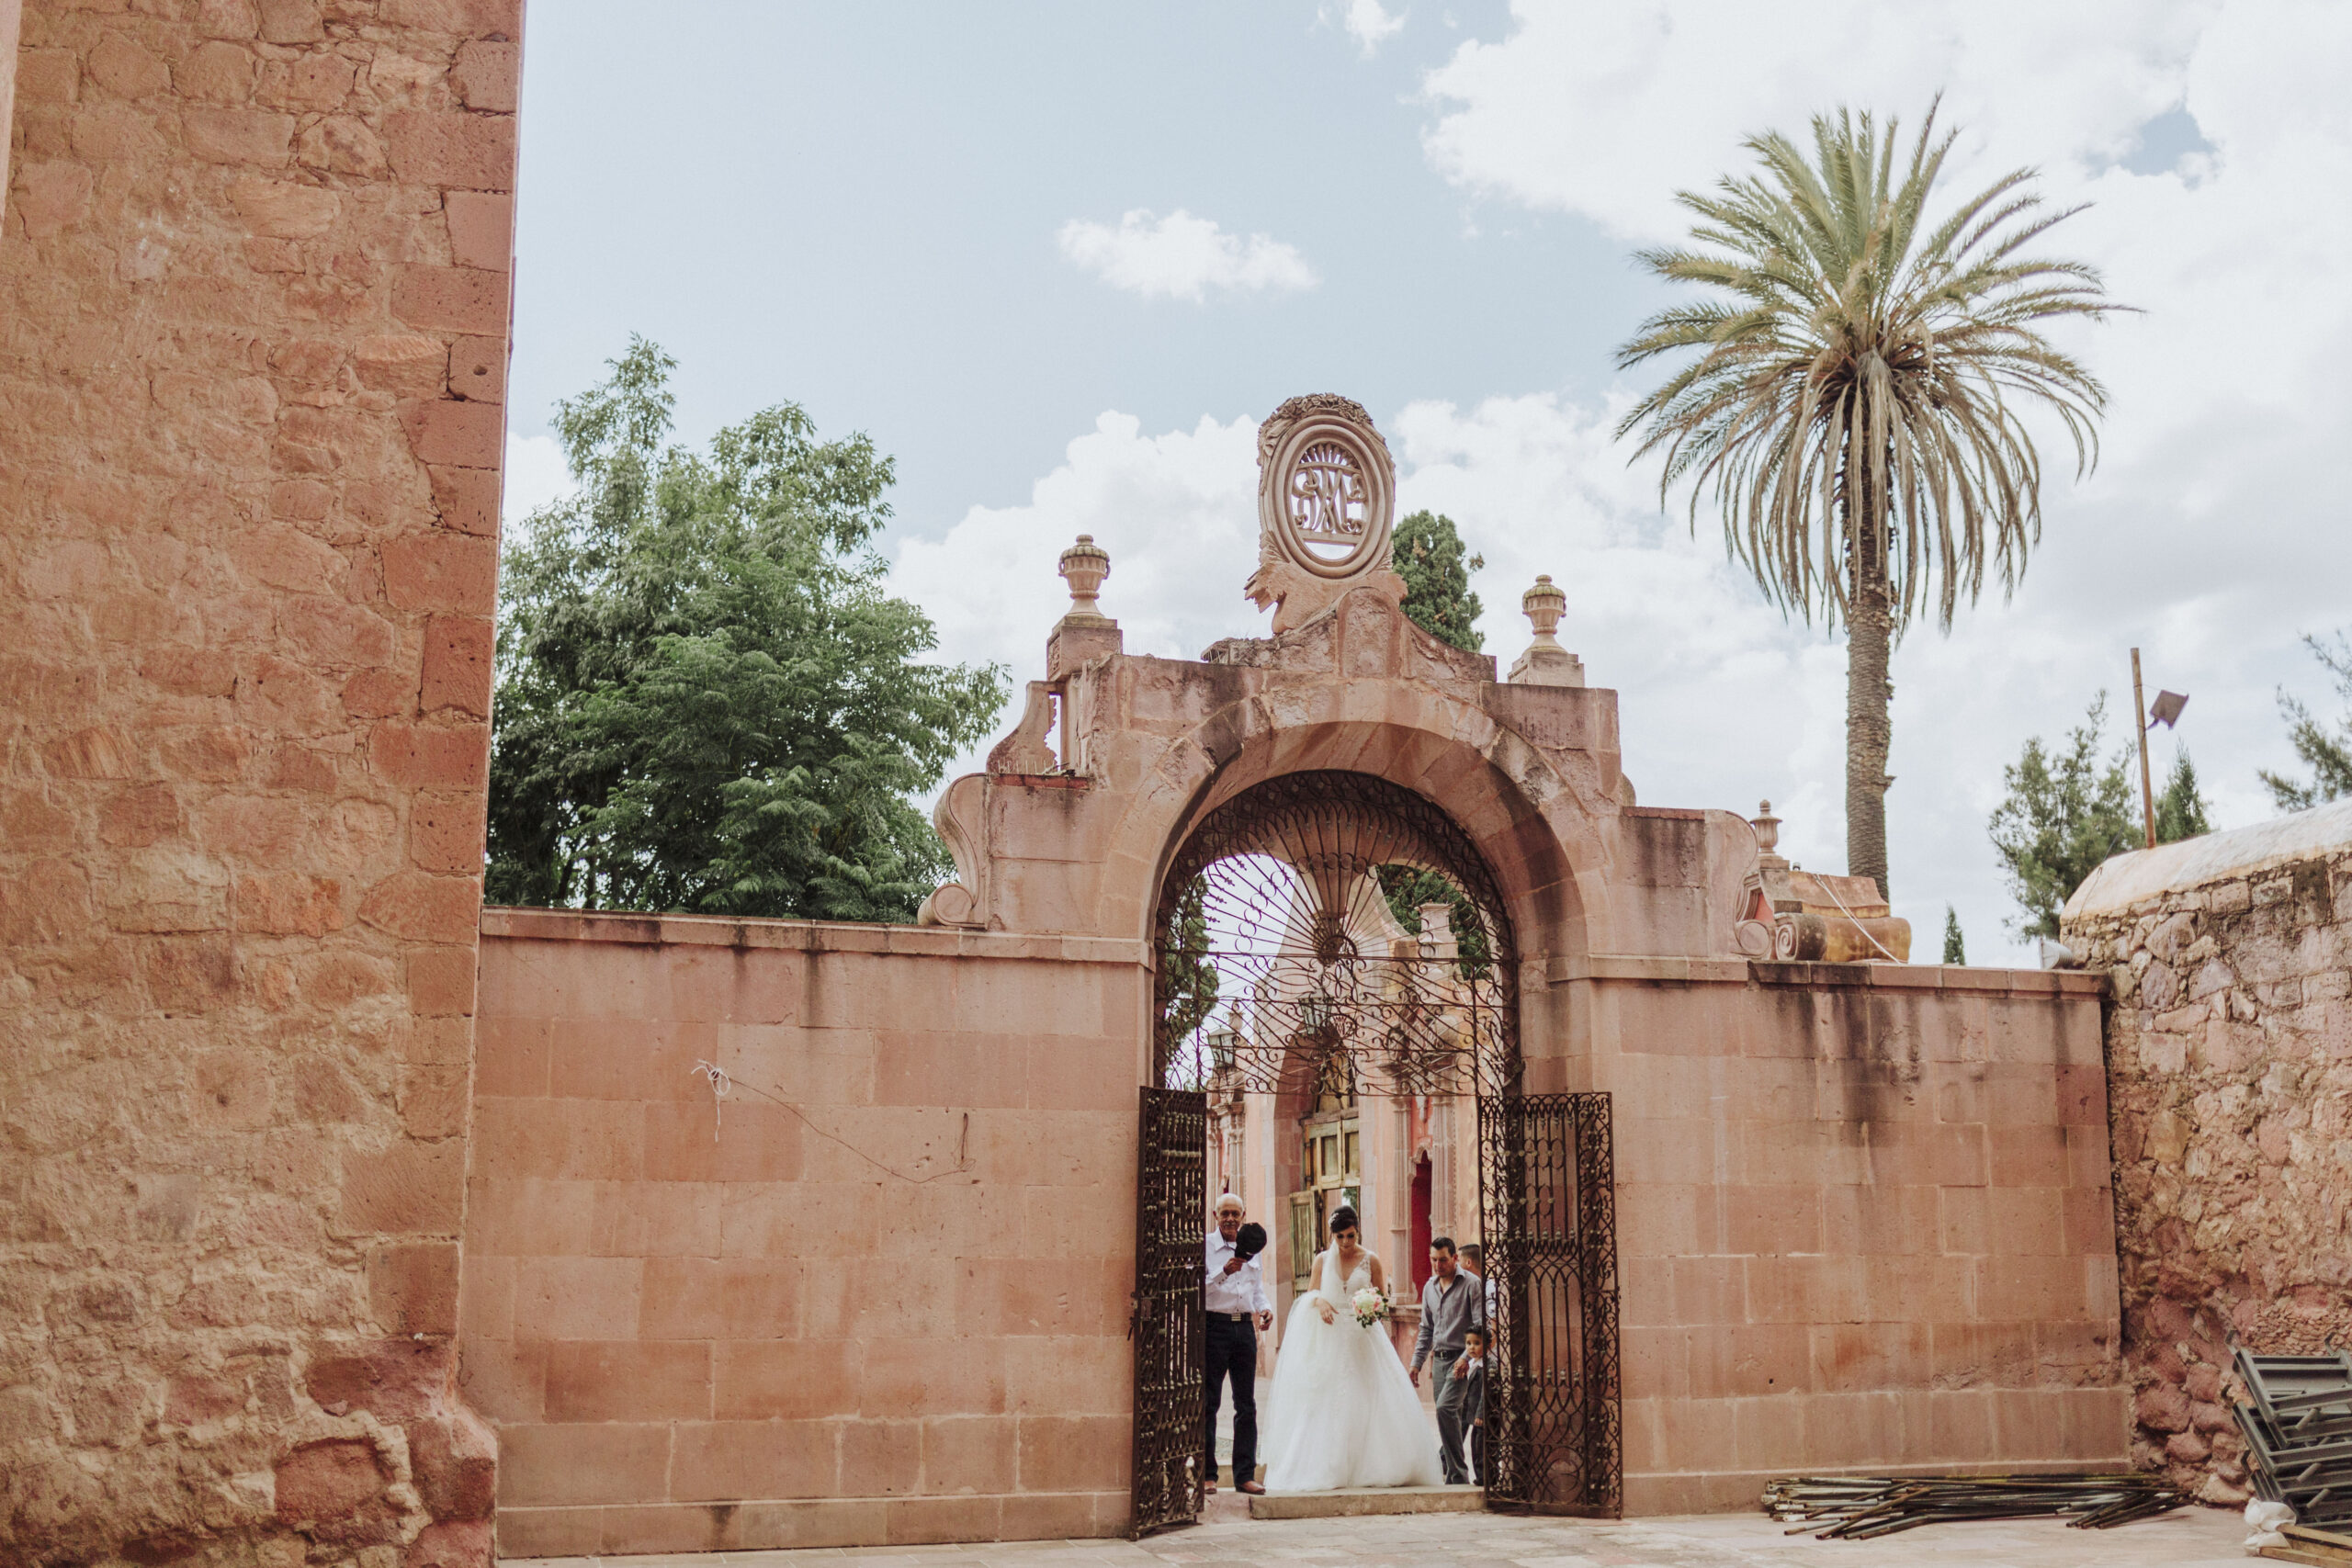 javier_noriega_fotografo_profesional_zacatecas_mexico_chihuahua_photographer8